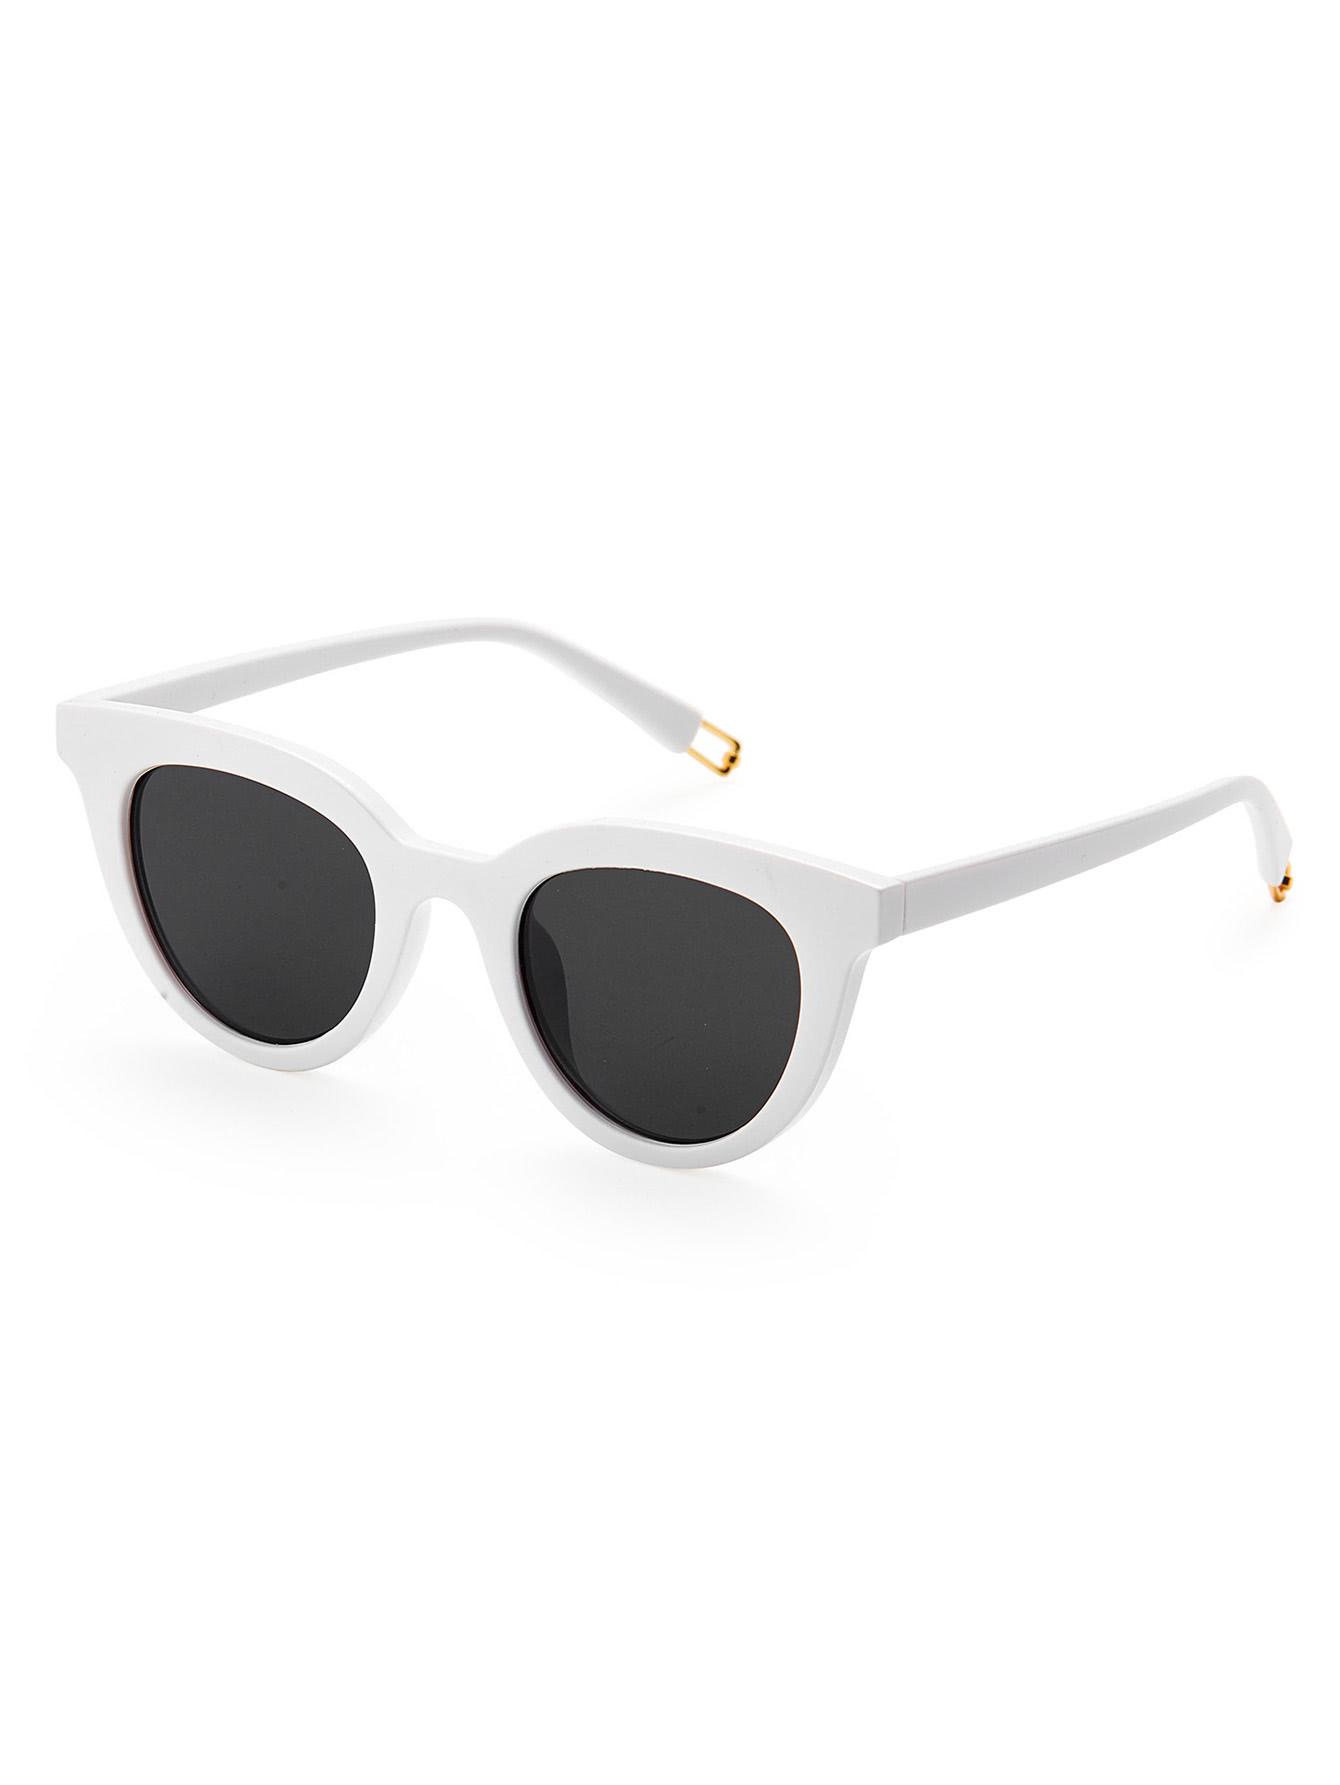 21a383b89f Flat Lens Cat Eye Sunglasses -SheIn(Sheinside) | Glasses and Sunnies ...